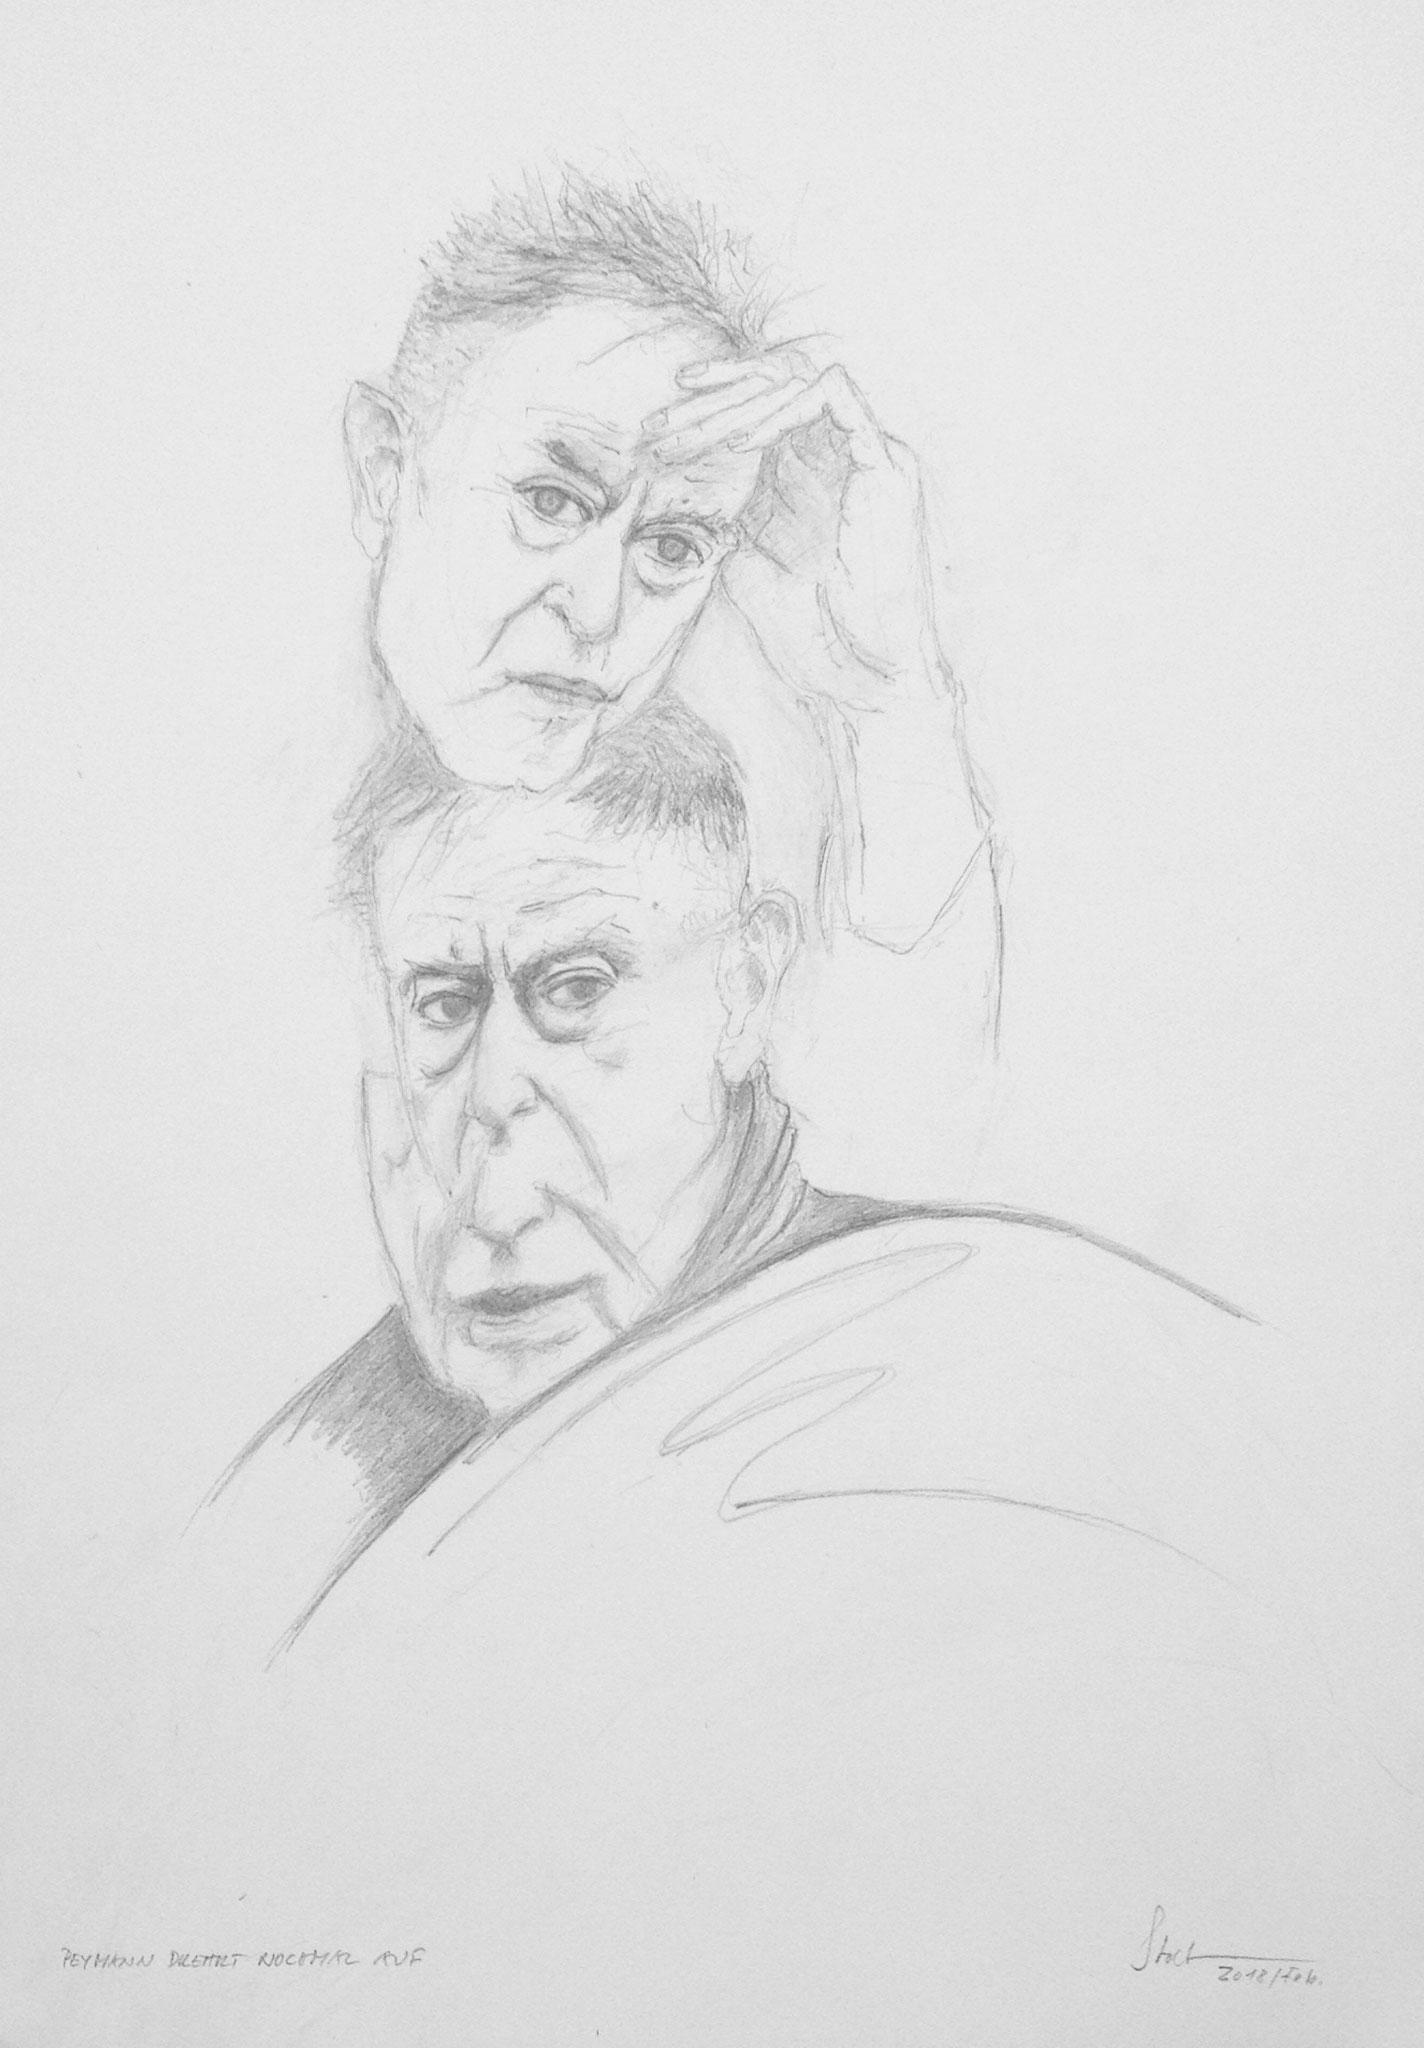 """Peymann dreht nochmal auf I"", 2018, Zeichnung, 40 x 30 cm (#840)"